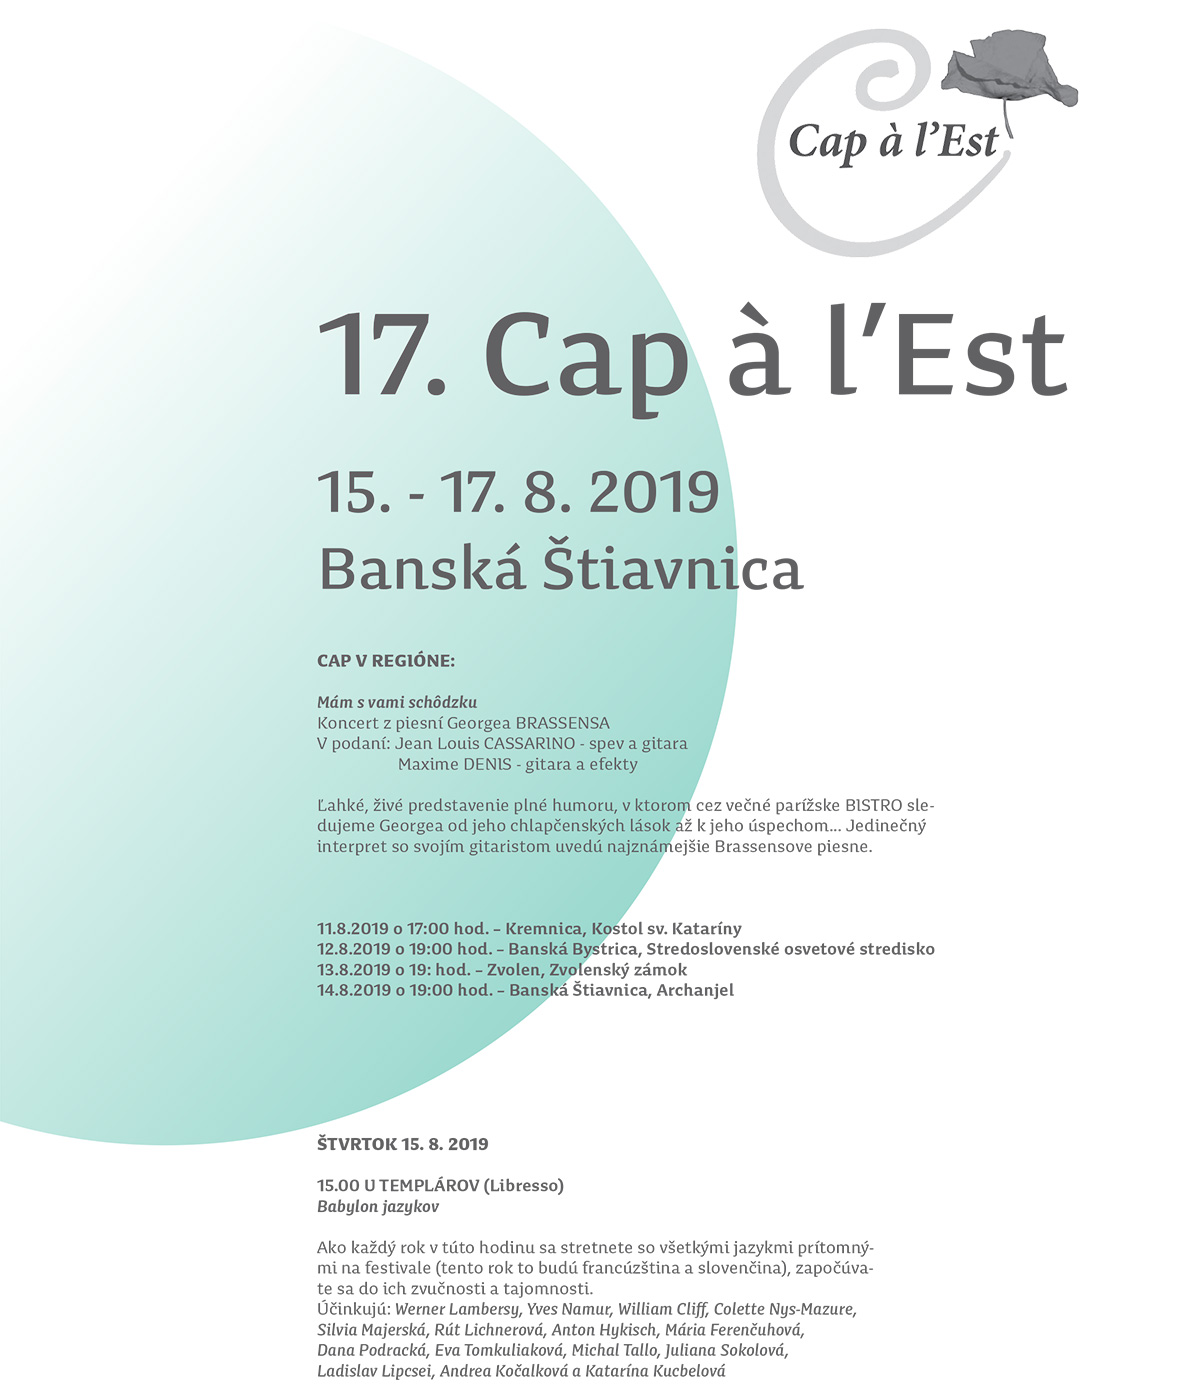 Capalest 2019